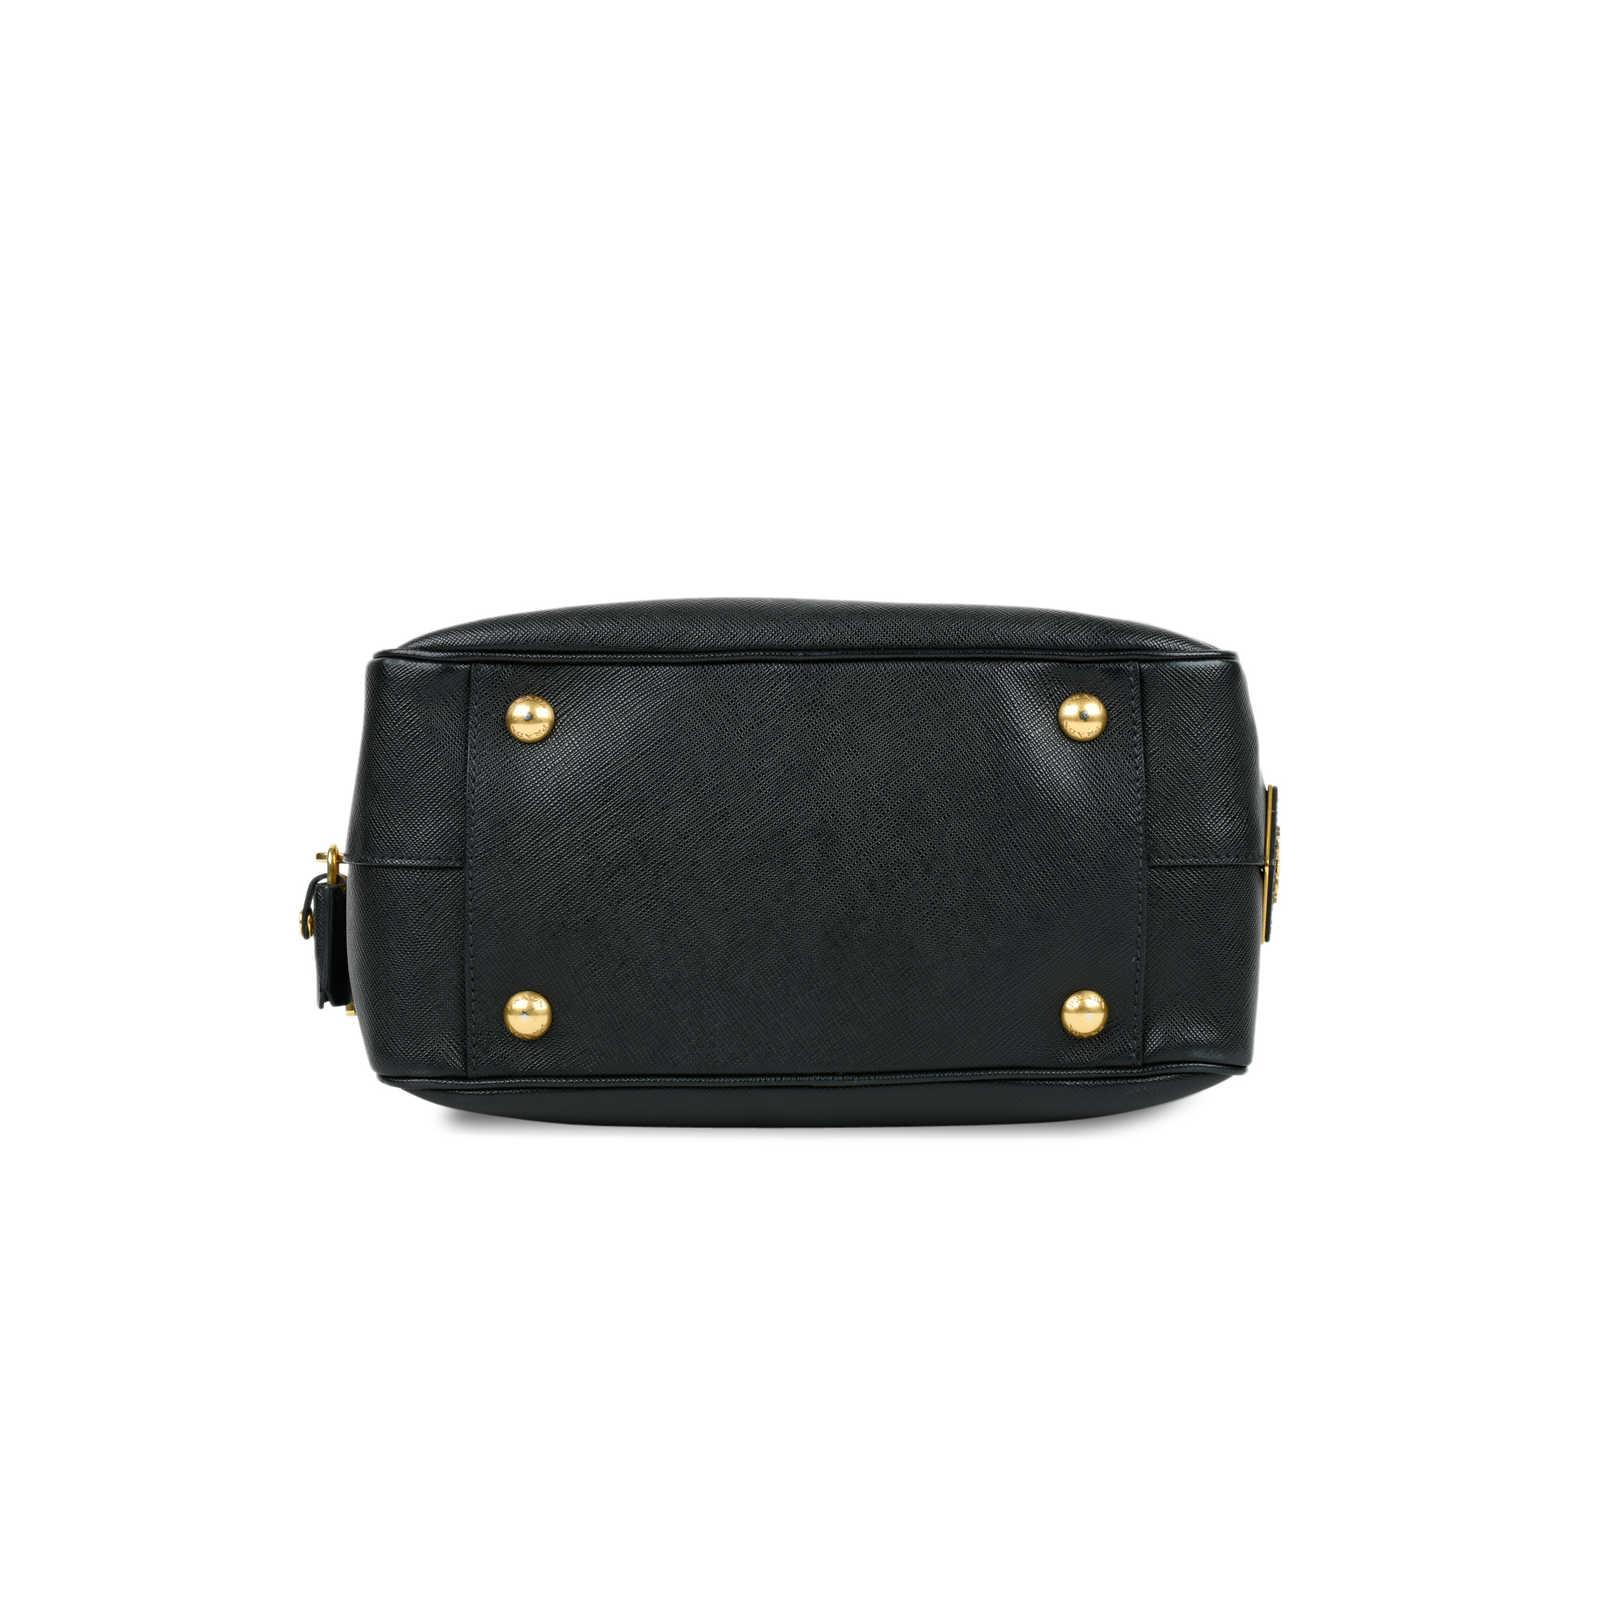 ... Authentic Second Hand Prada Saffiano Box Satchel Bag (PSS-485-00001) ... 33ebc9366b7a3